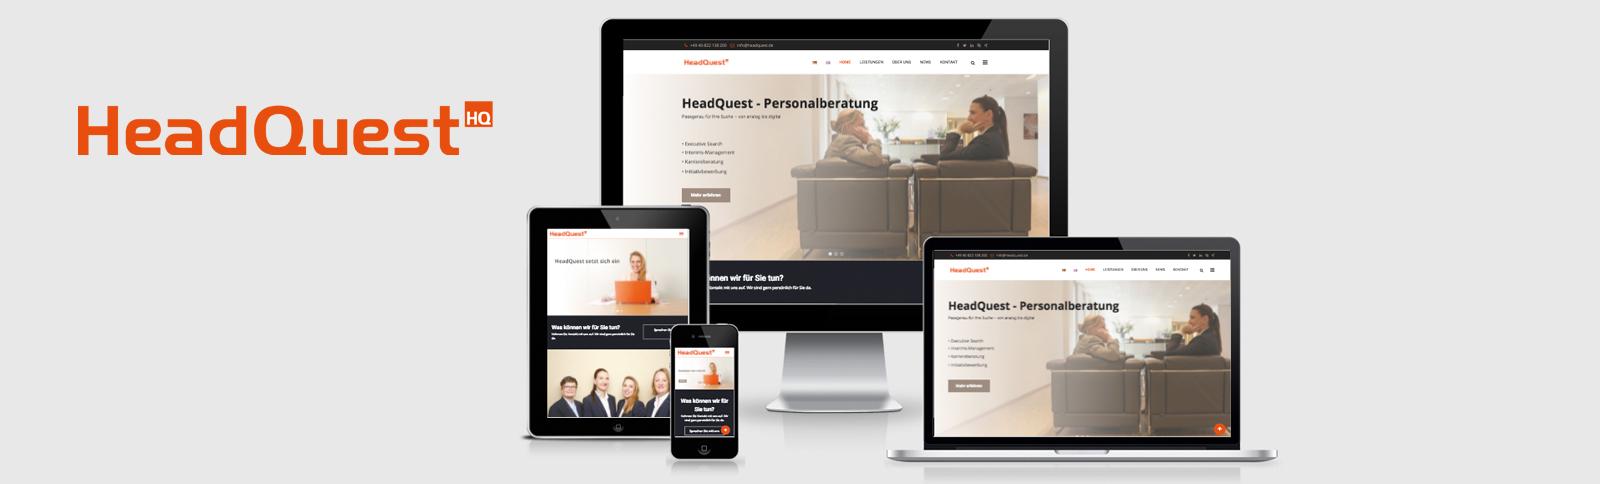 HeadQuest GmbH